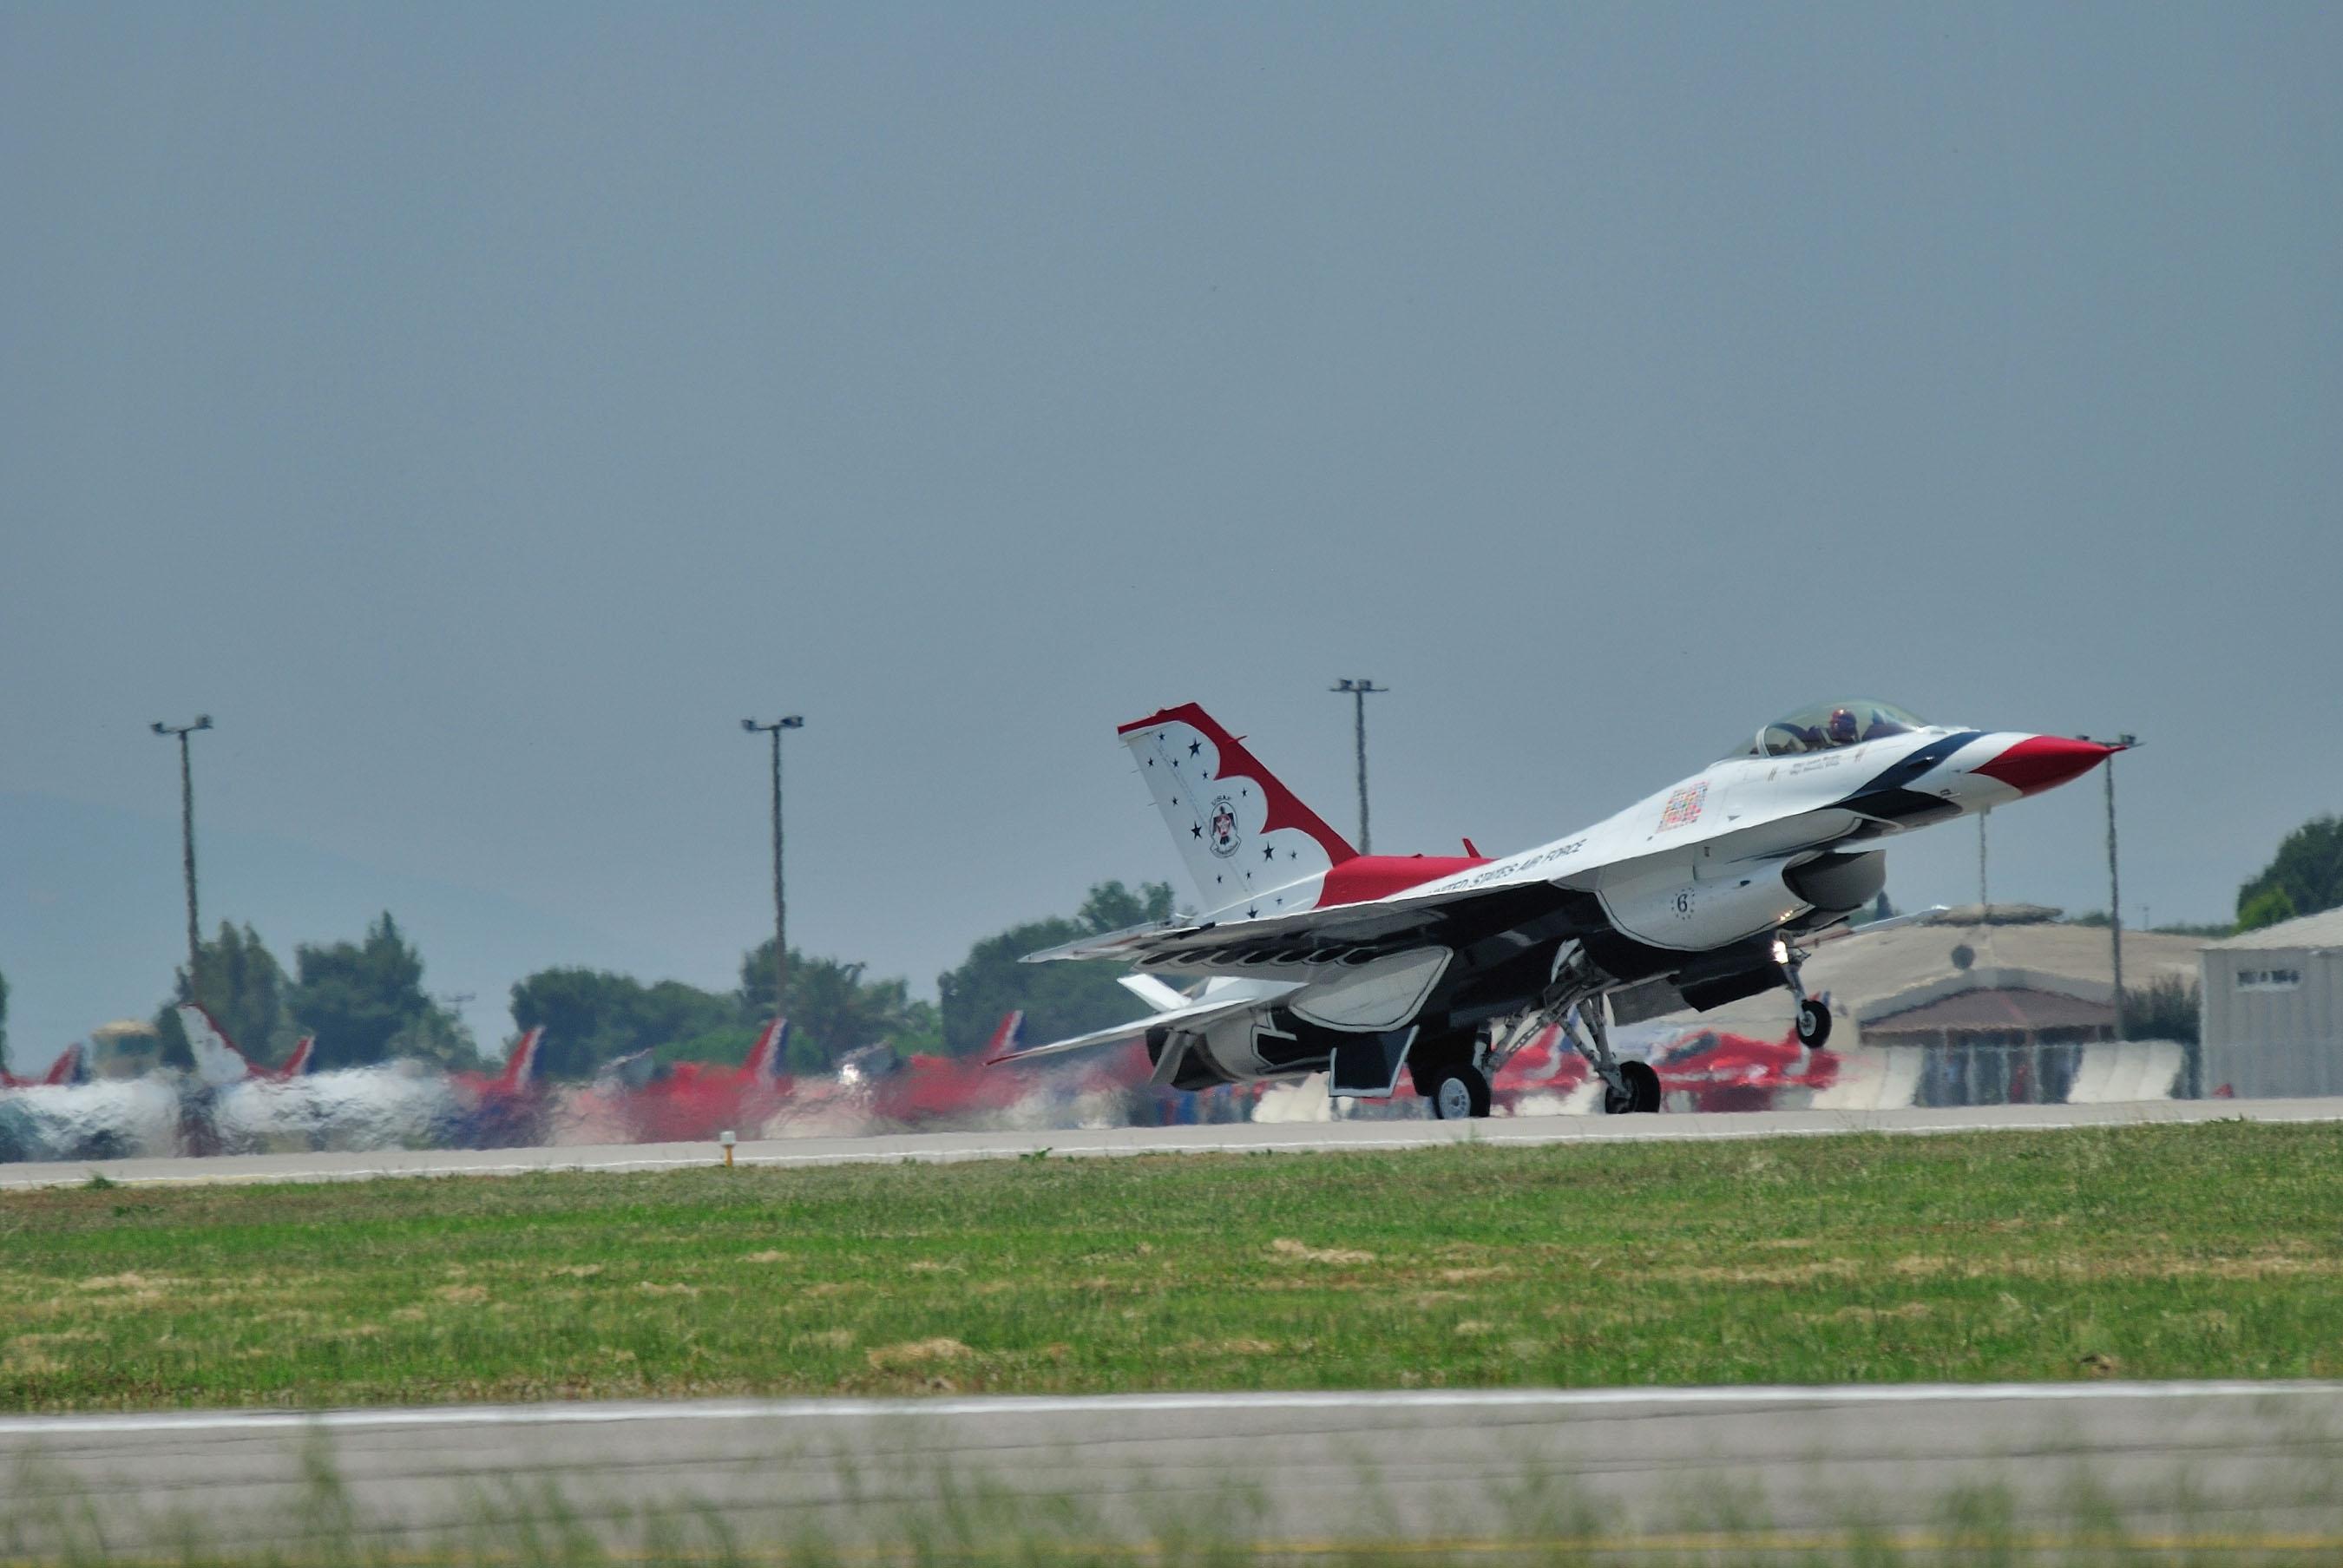 #6 landing during Izmir Air Show 2011, Turkey